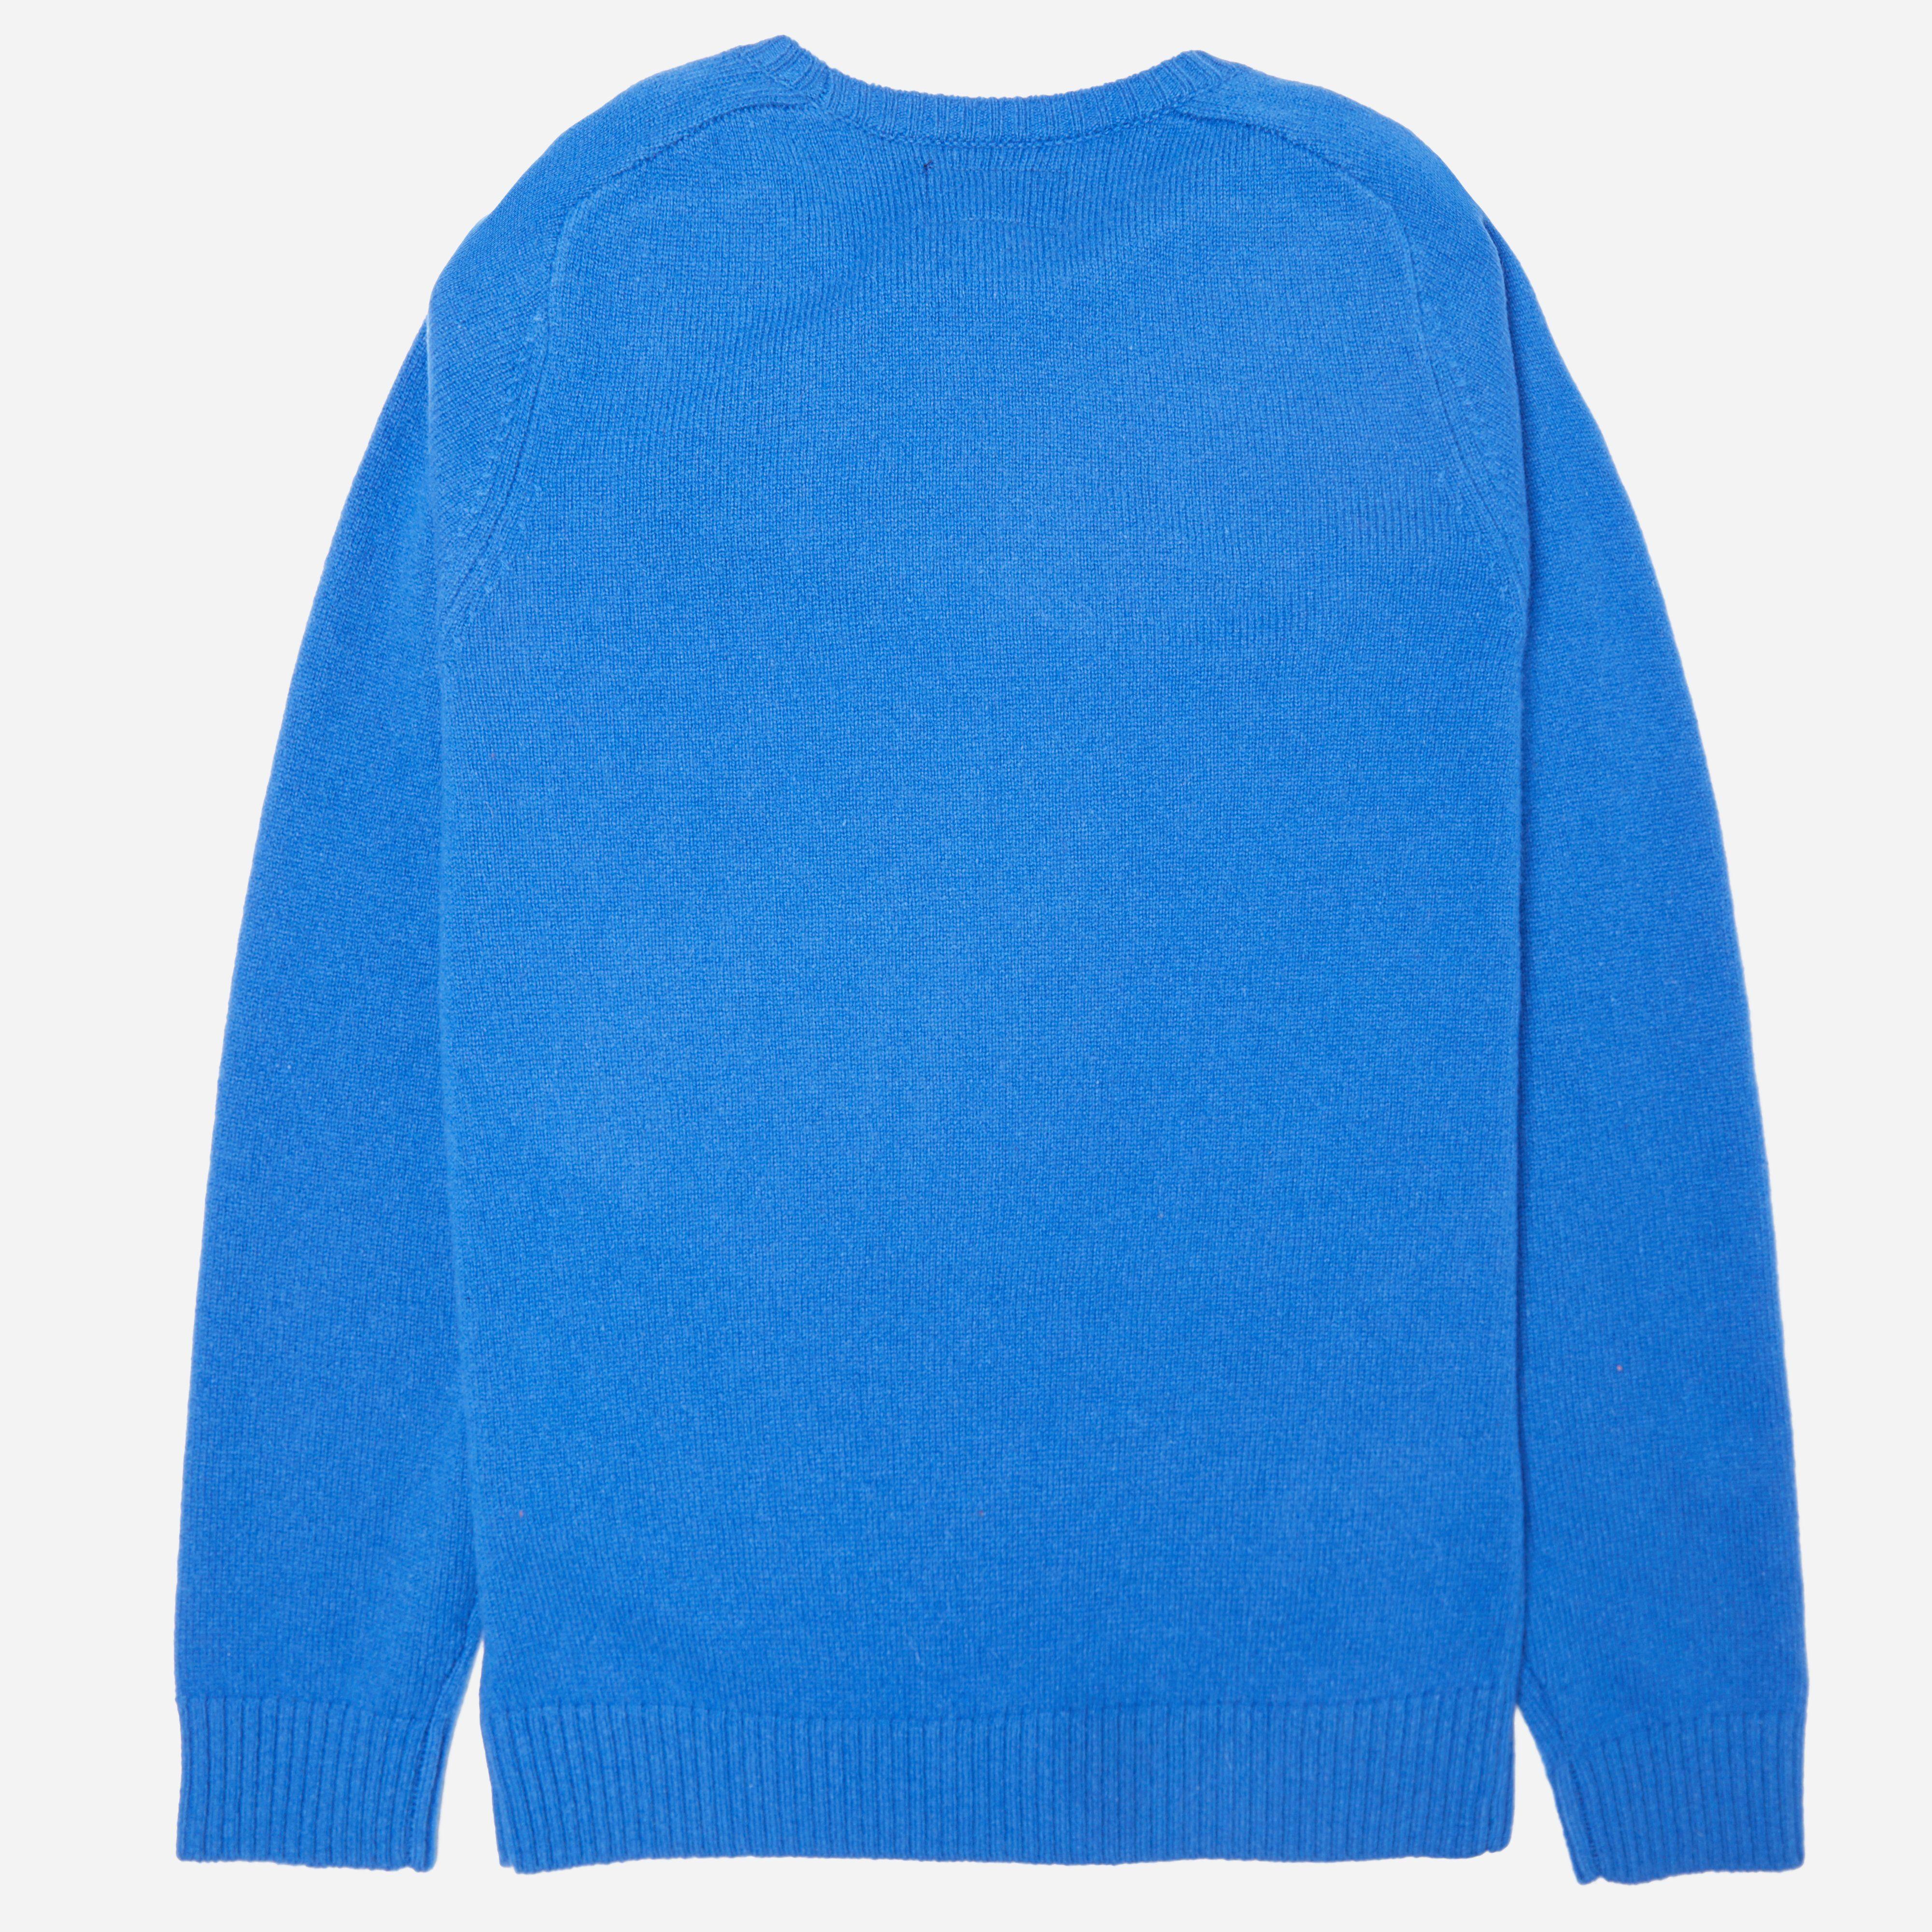 Beams Plus Lambswool Crew Knit